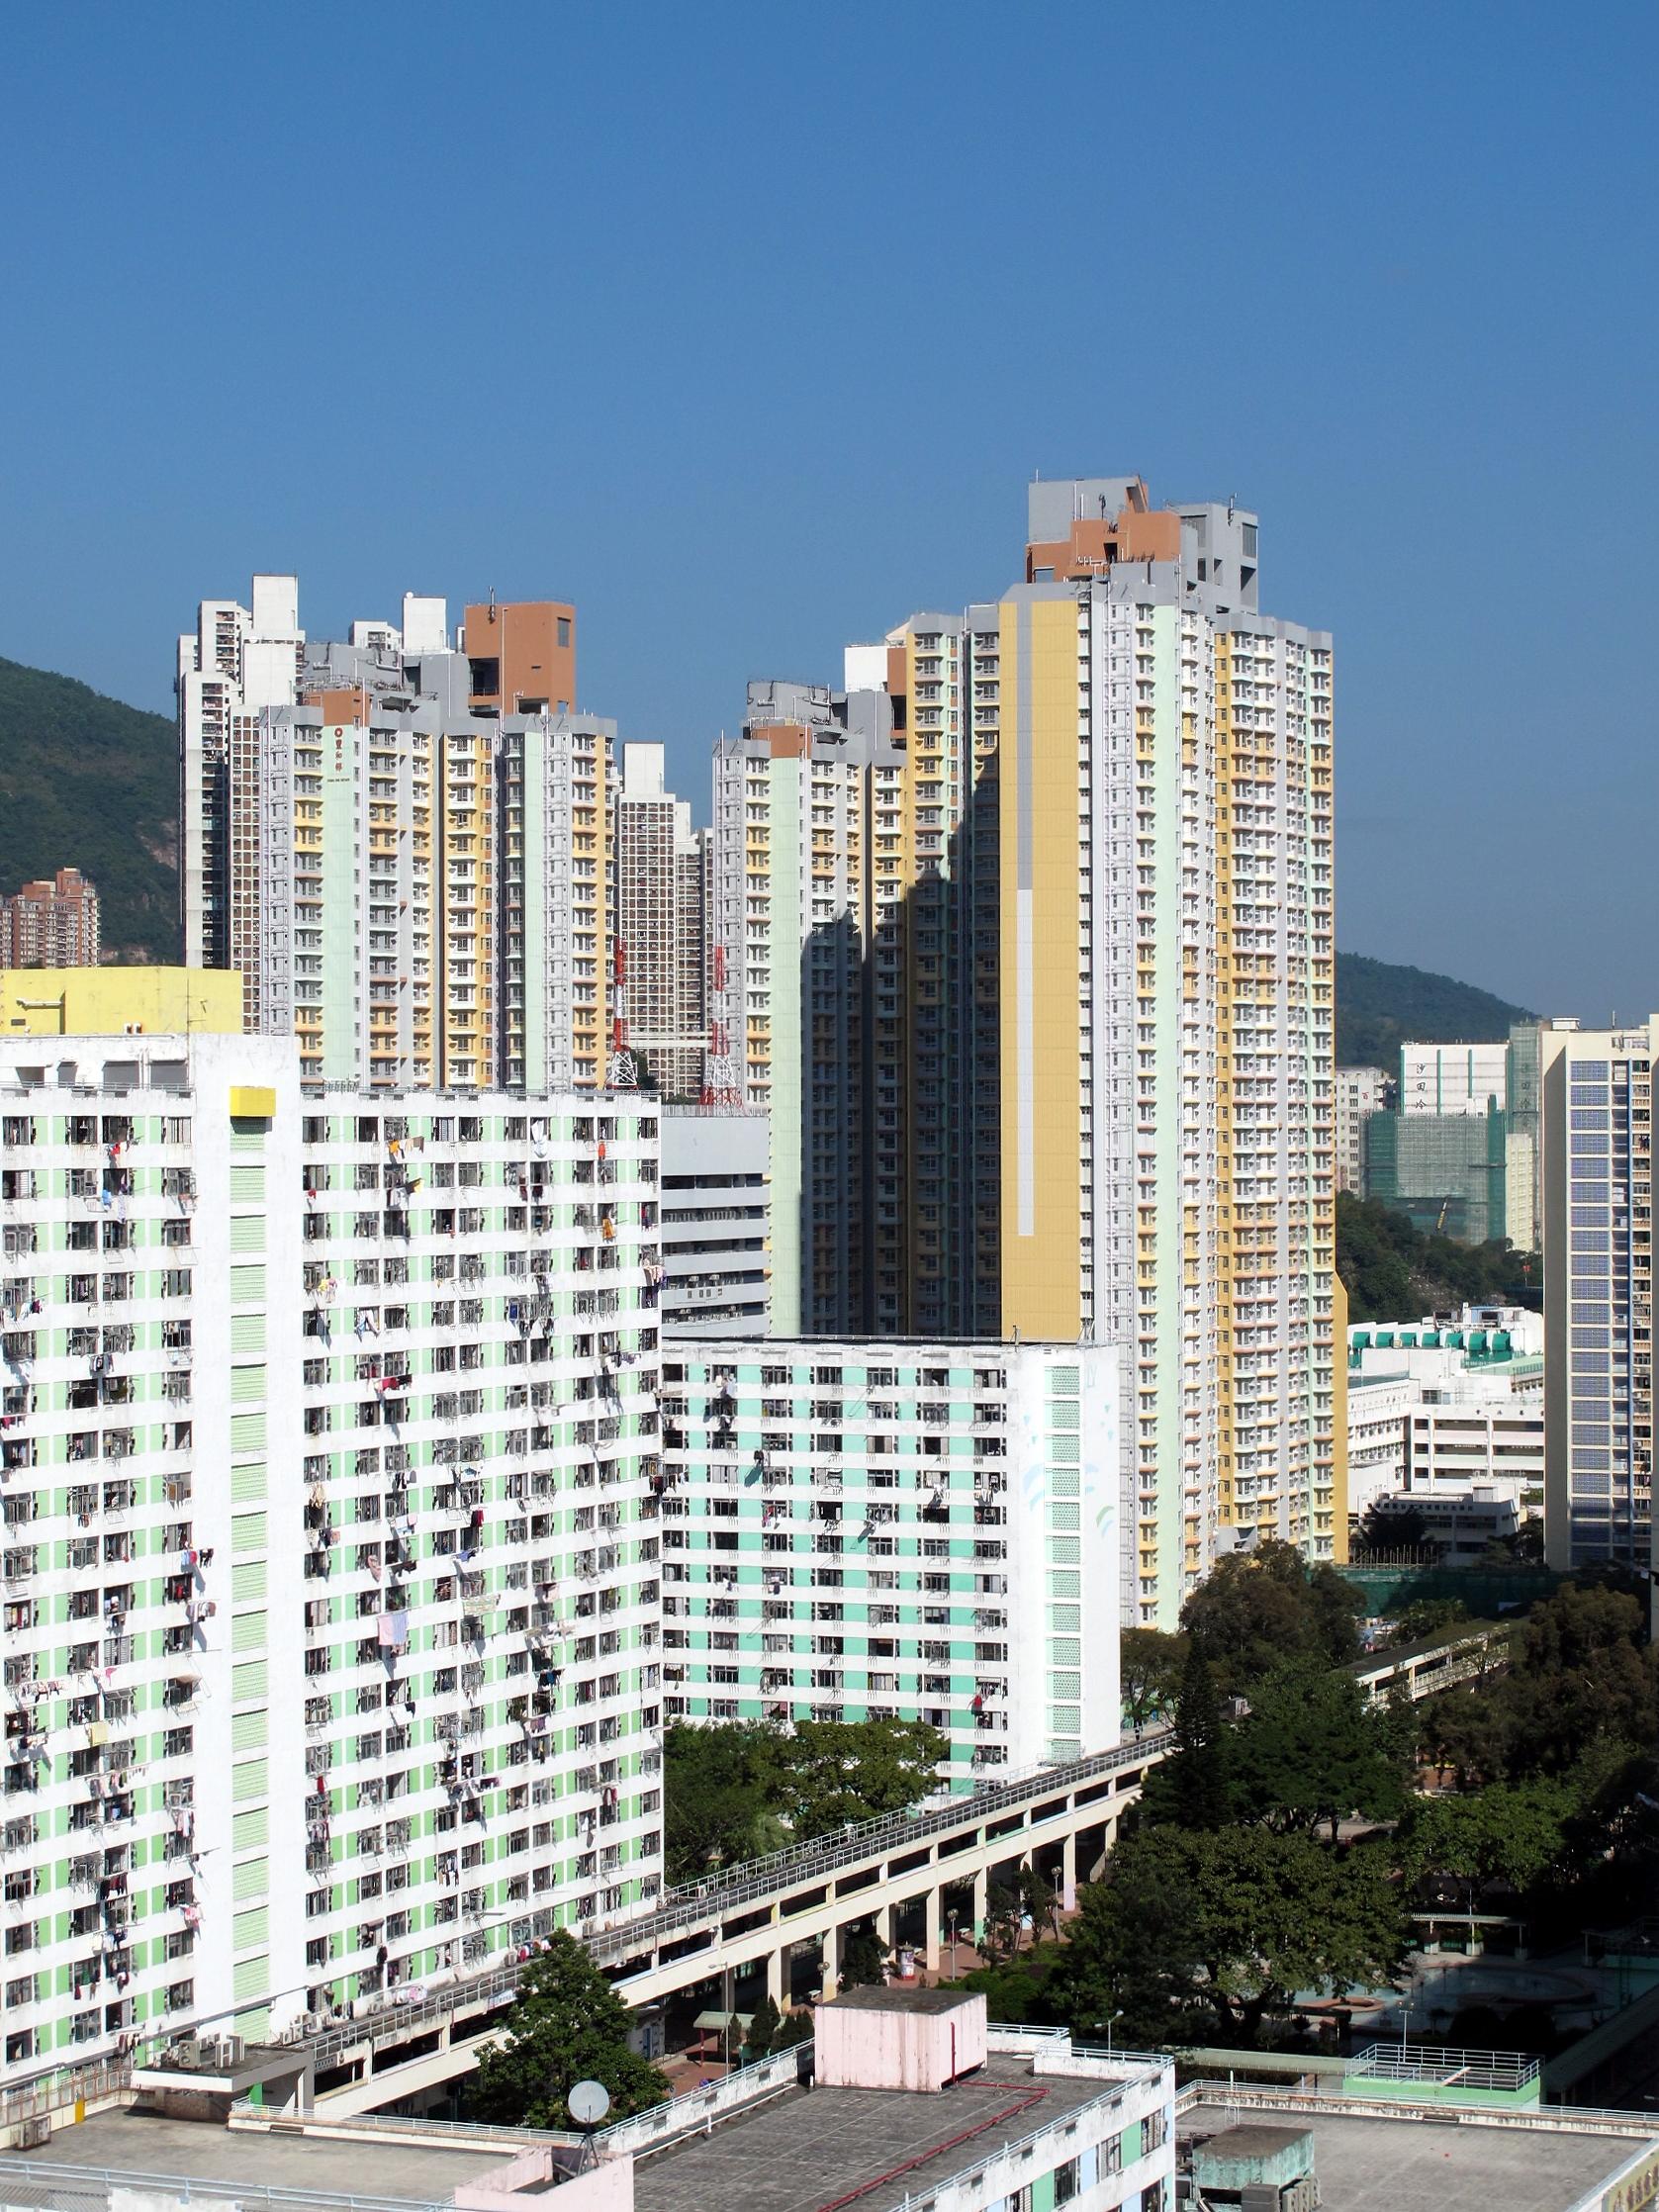 Fung_Wo_Estate_Site_View_jpg